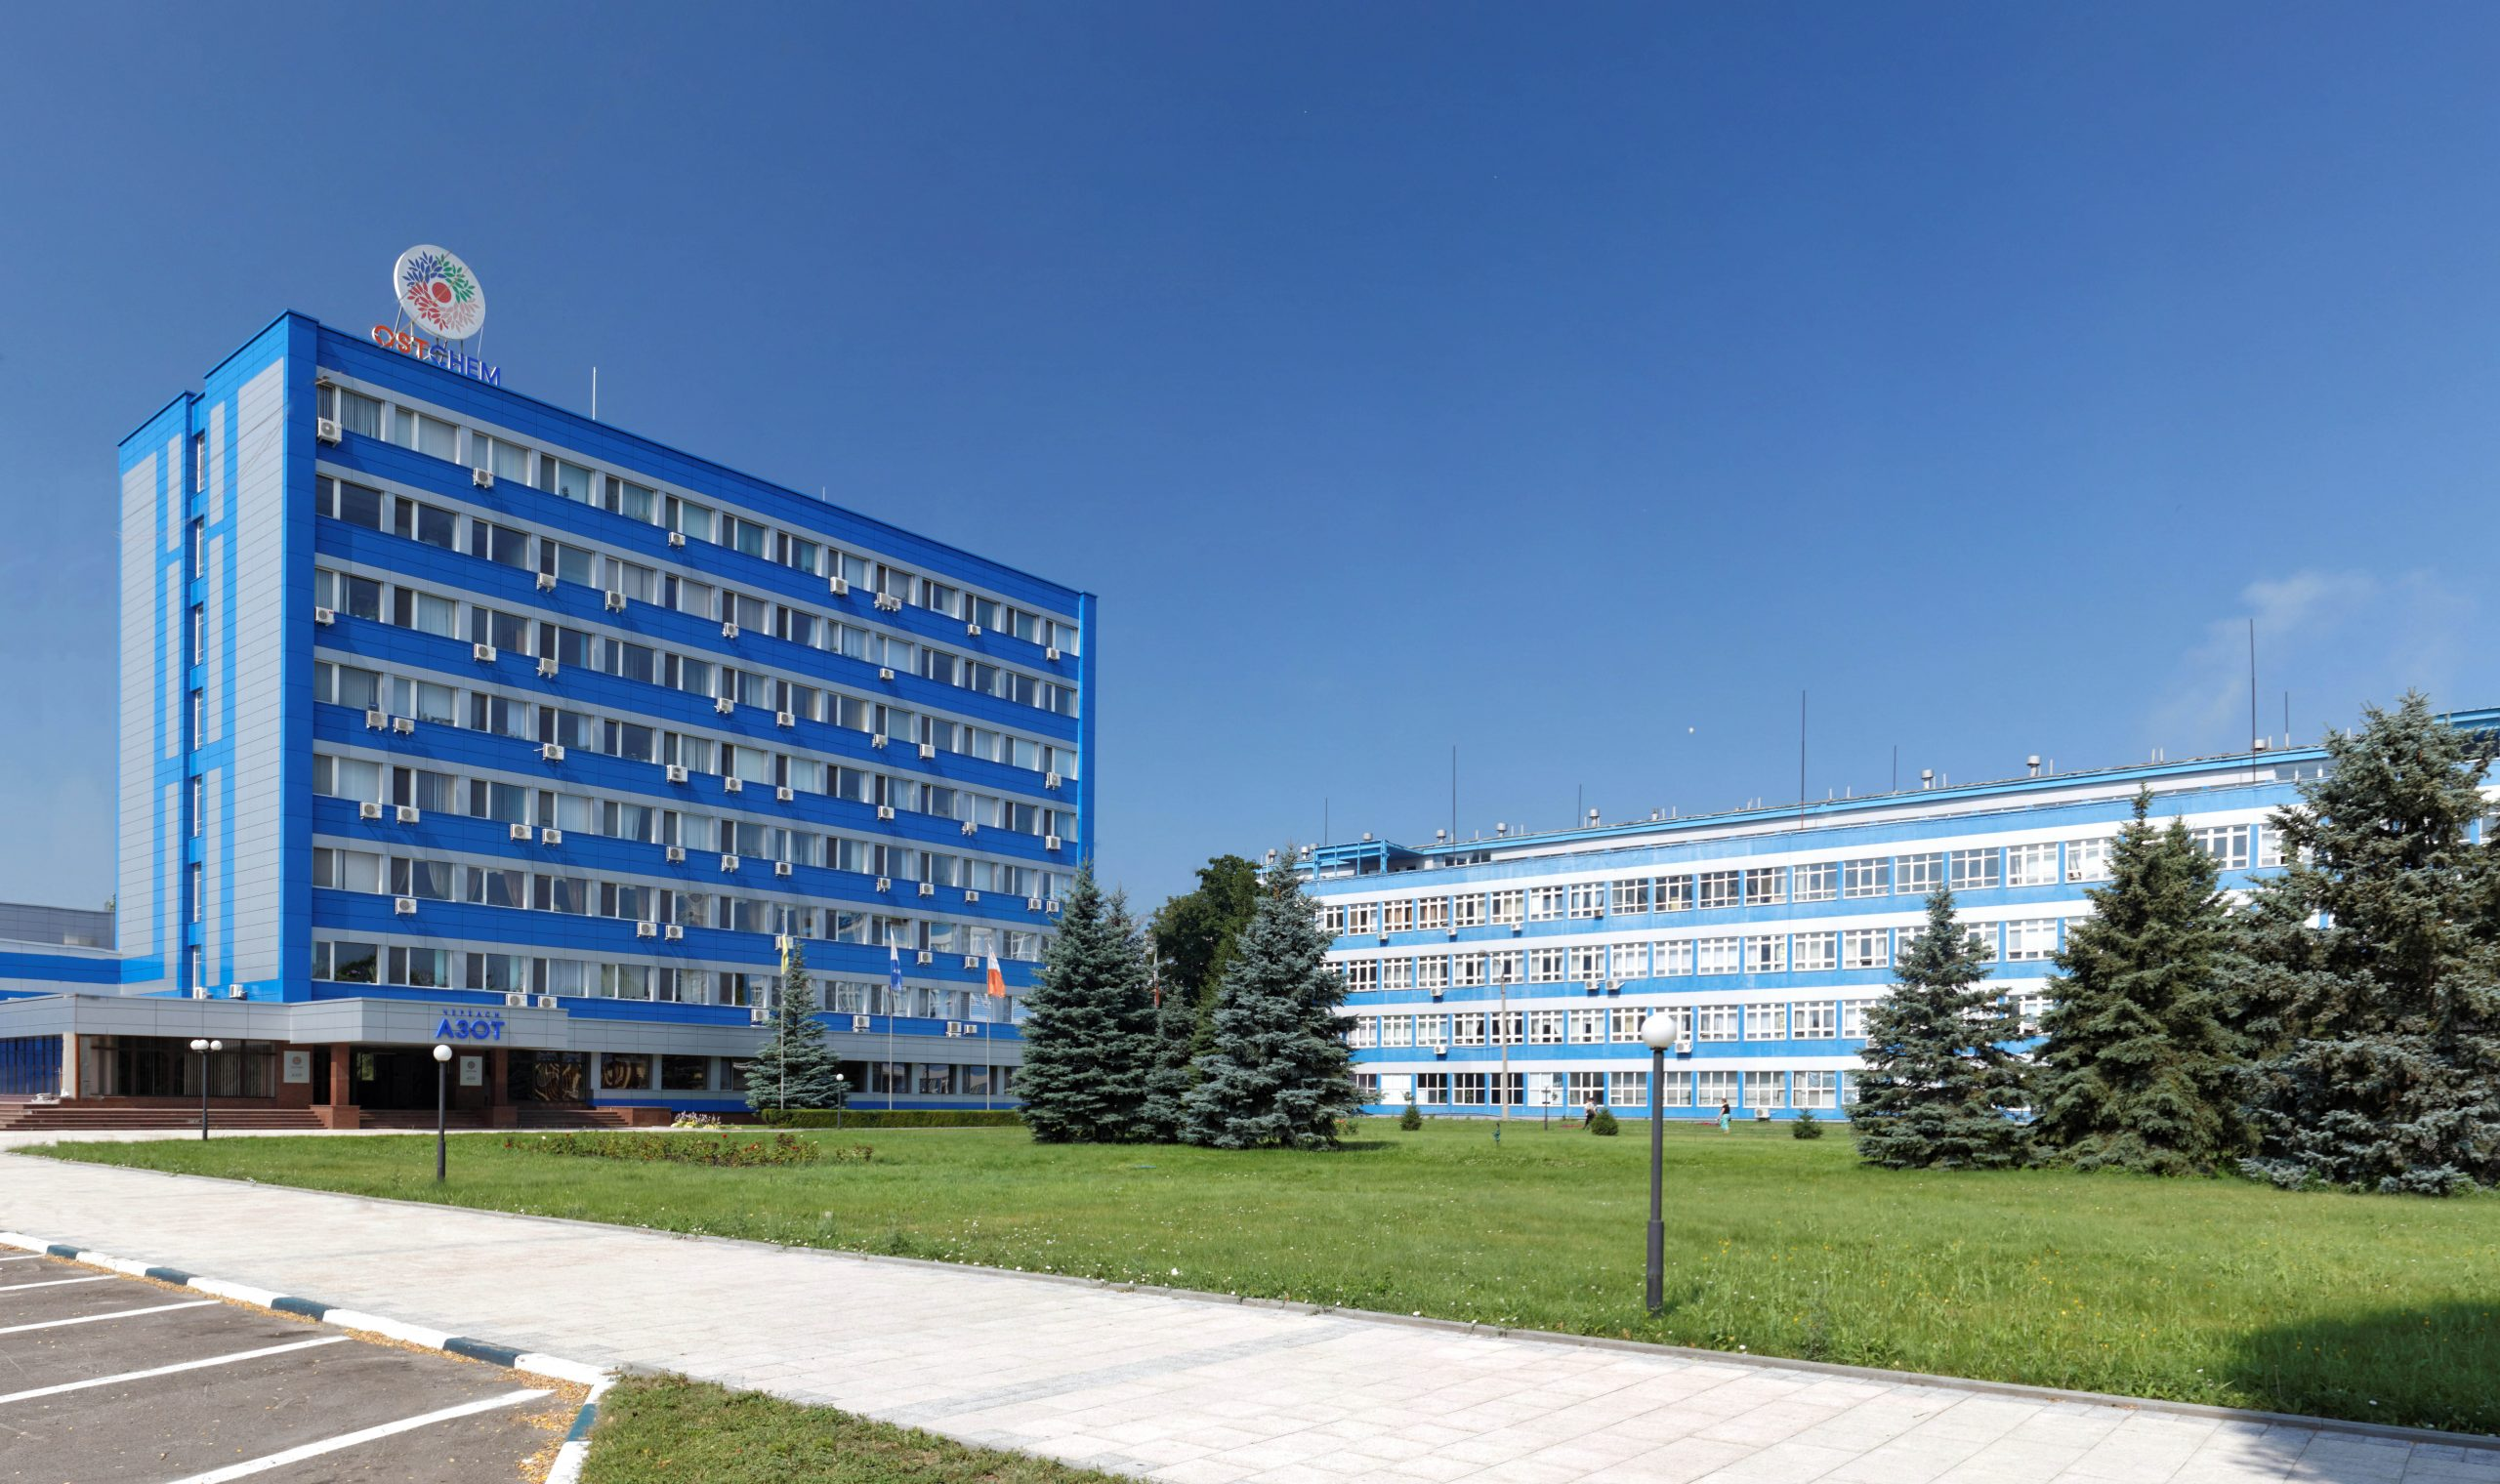 У Черкасах прокуратура вимагає стягнути з ПАТ «Азот» майже 7 млн грн